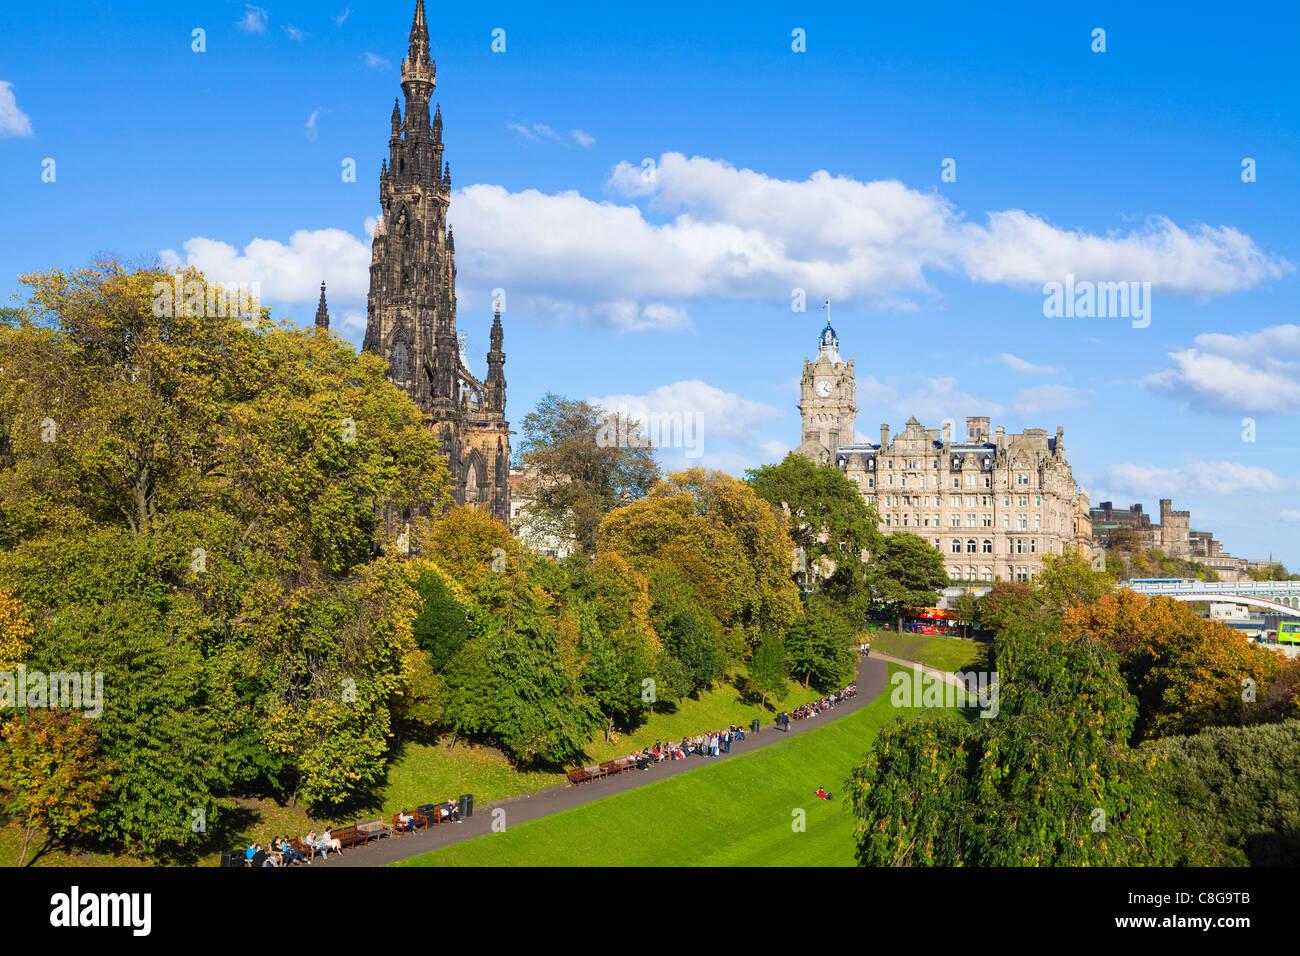 Princes Street Gardens, Edinburgh, Lothian, Scotland, United Kingdom - Stock Image